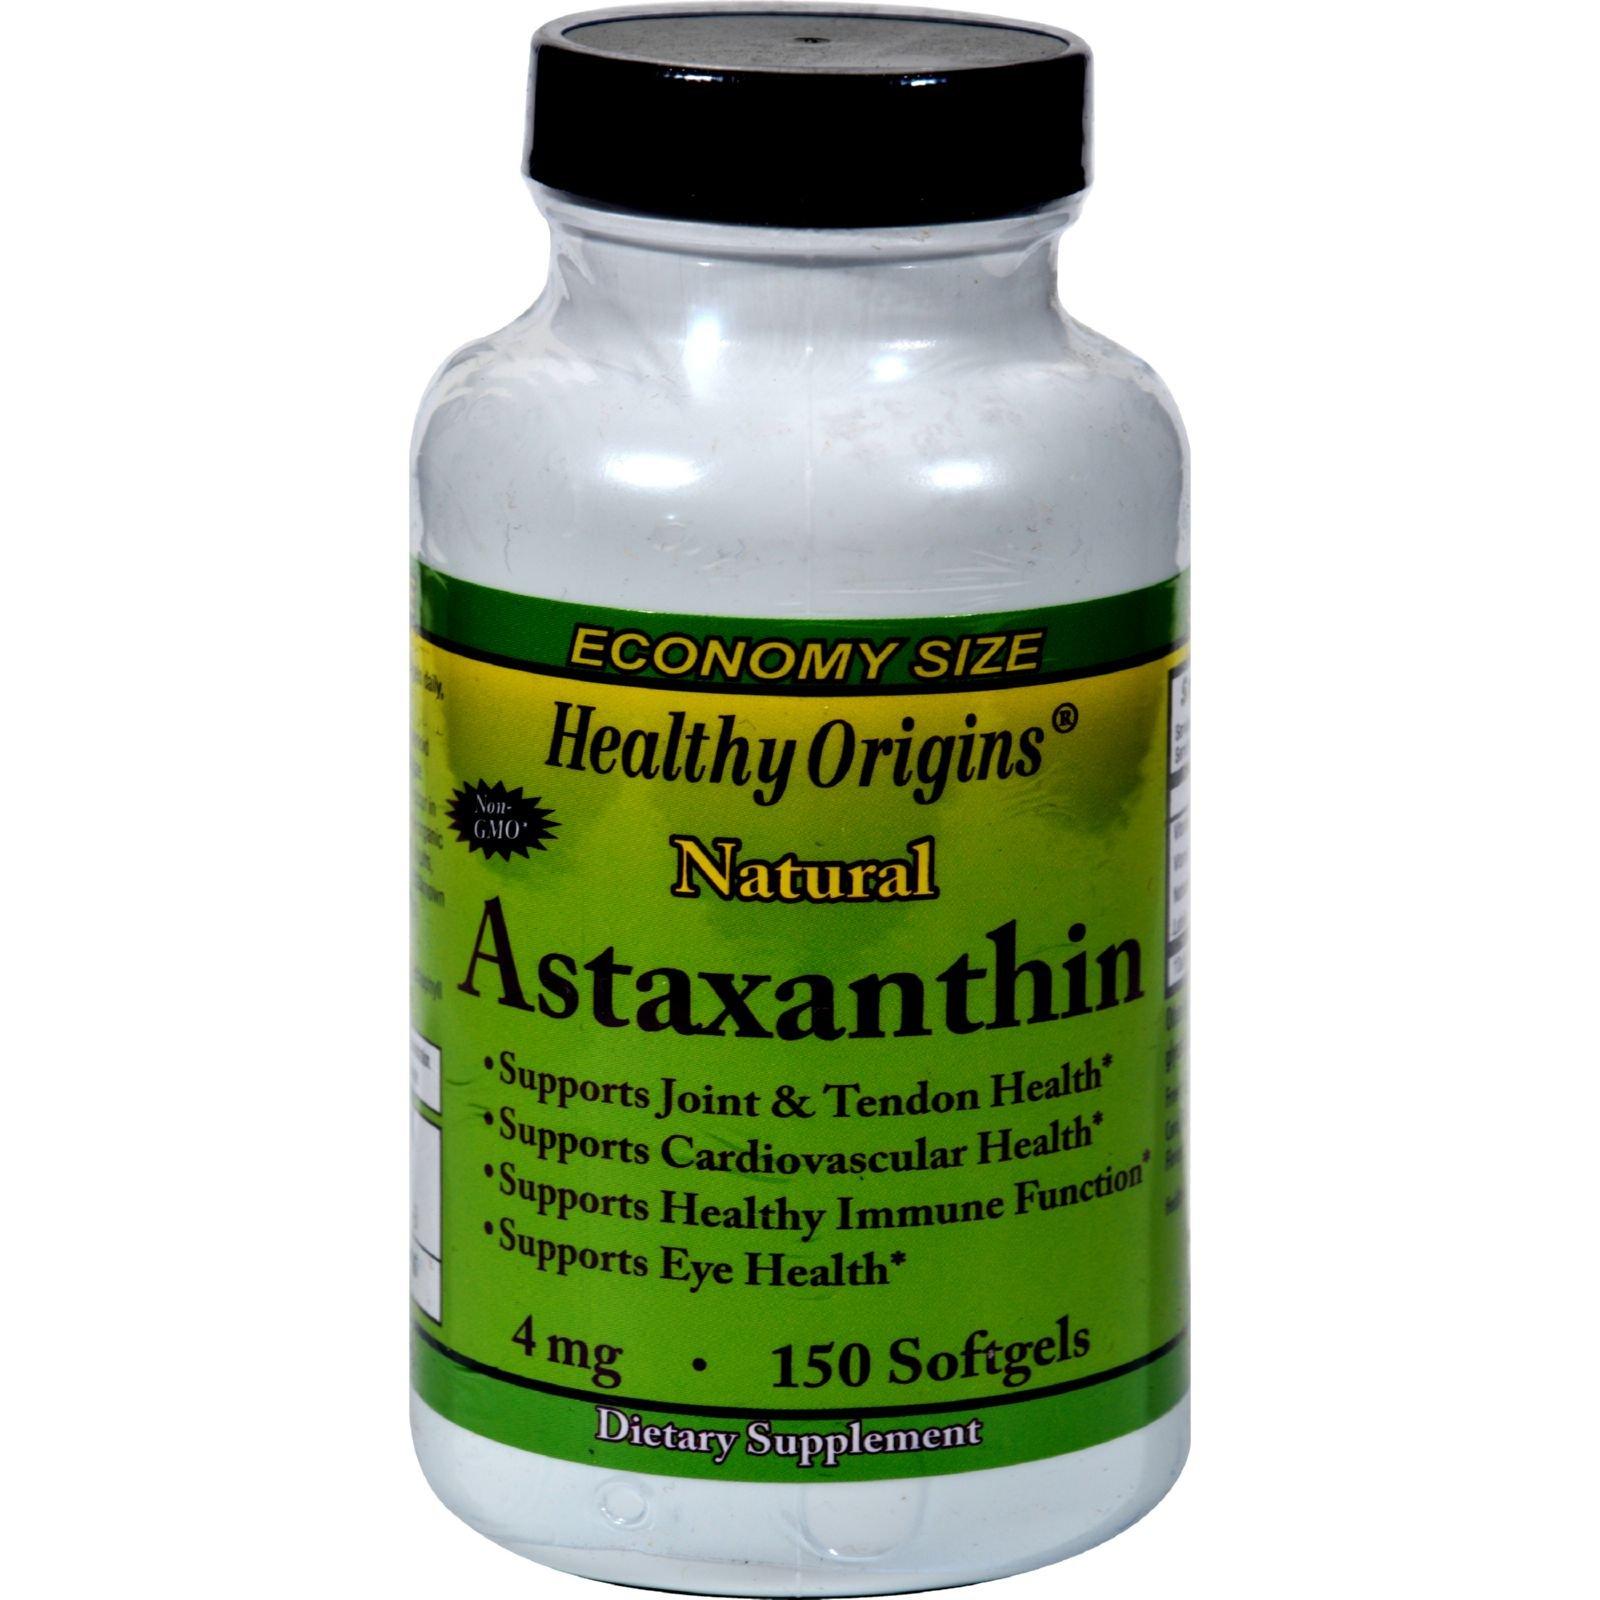 2Pack! Healthy Origins Astaxanthin - 4 mg - 150 Softgels